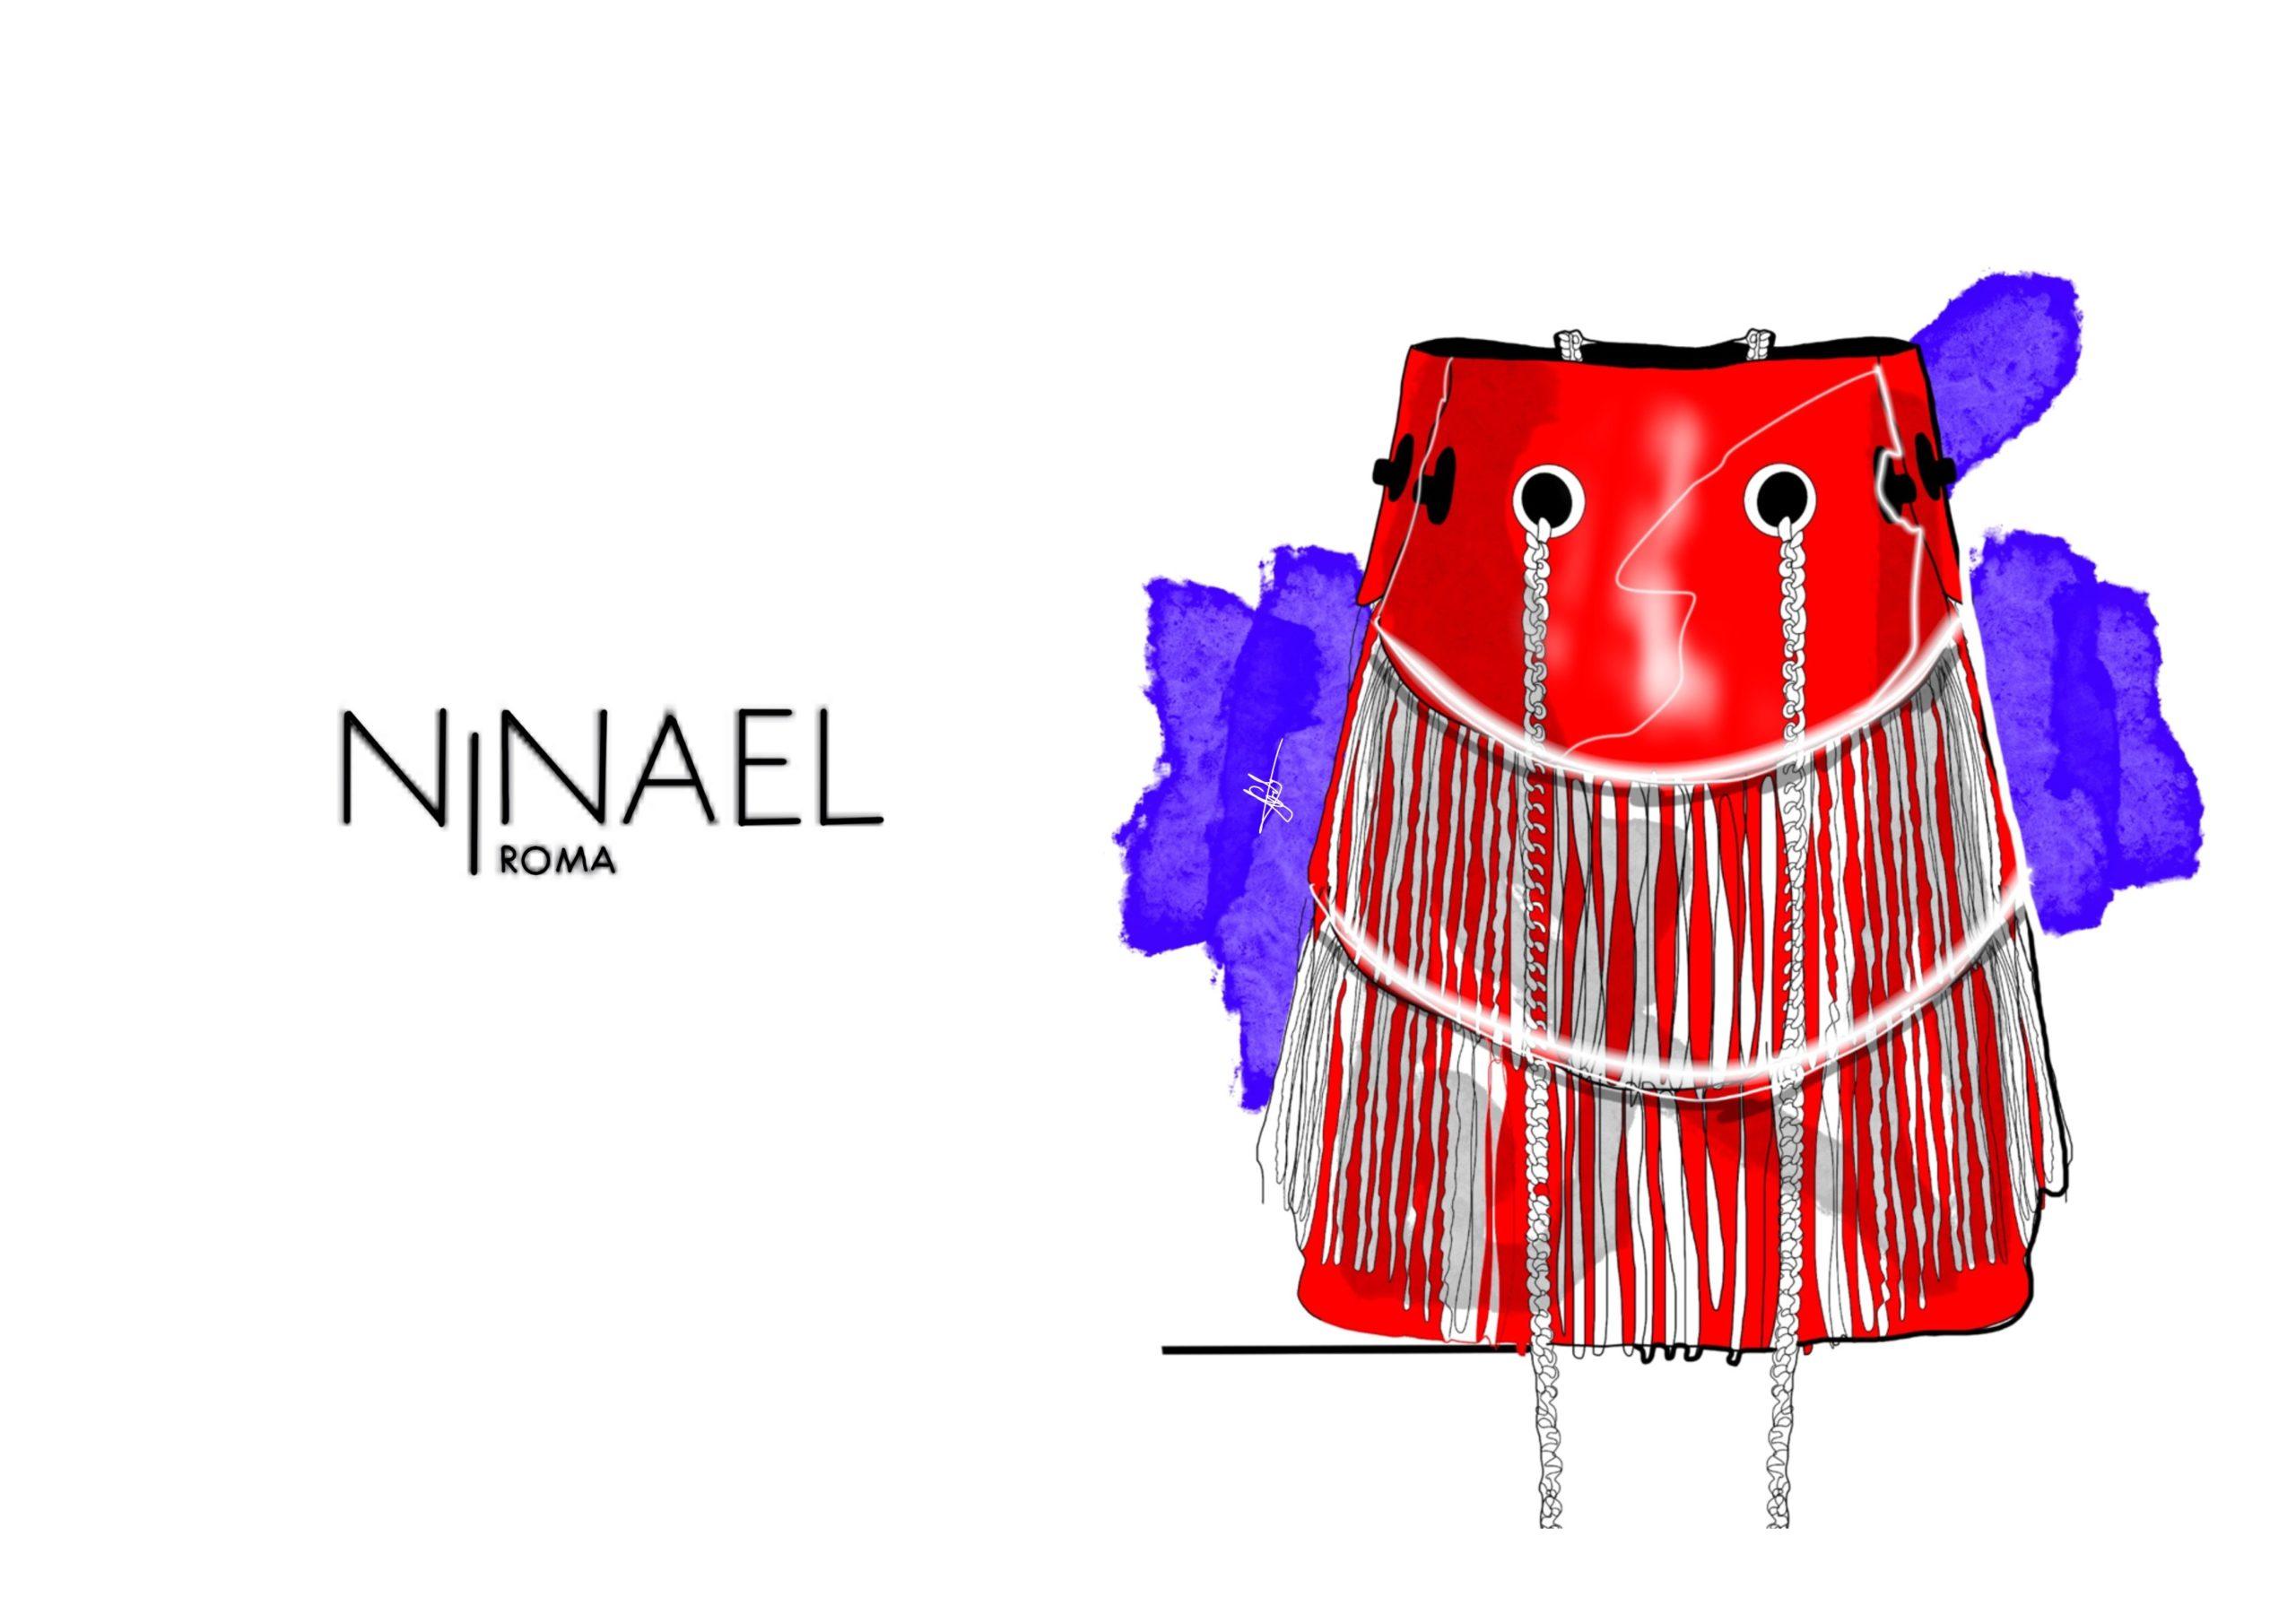 Illustrations by Gabriele Melodia of Ninael Roma Handbags